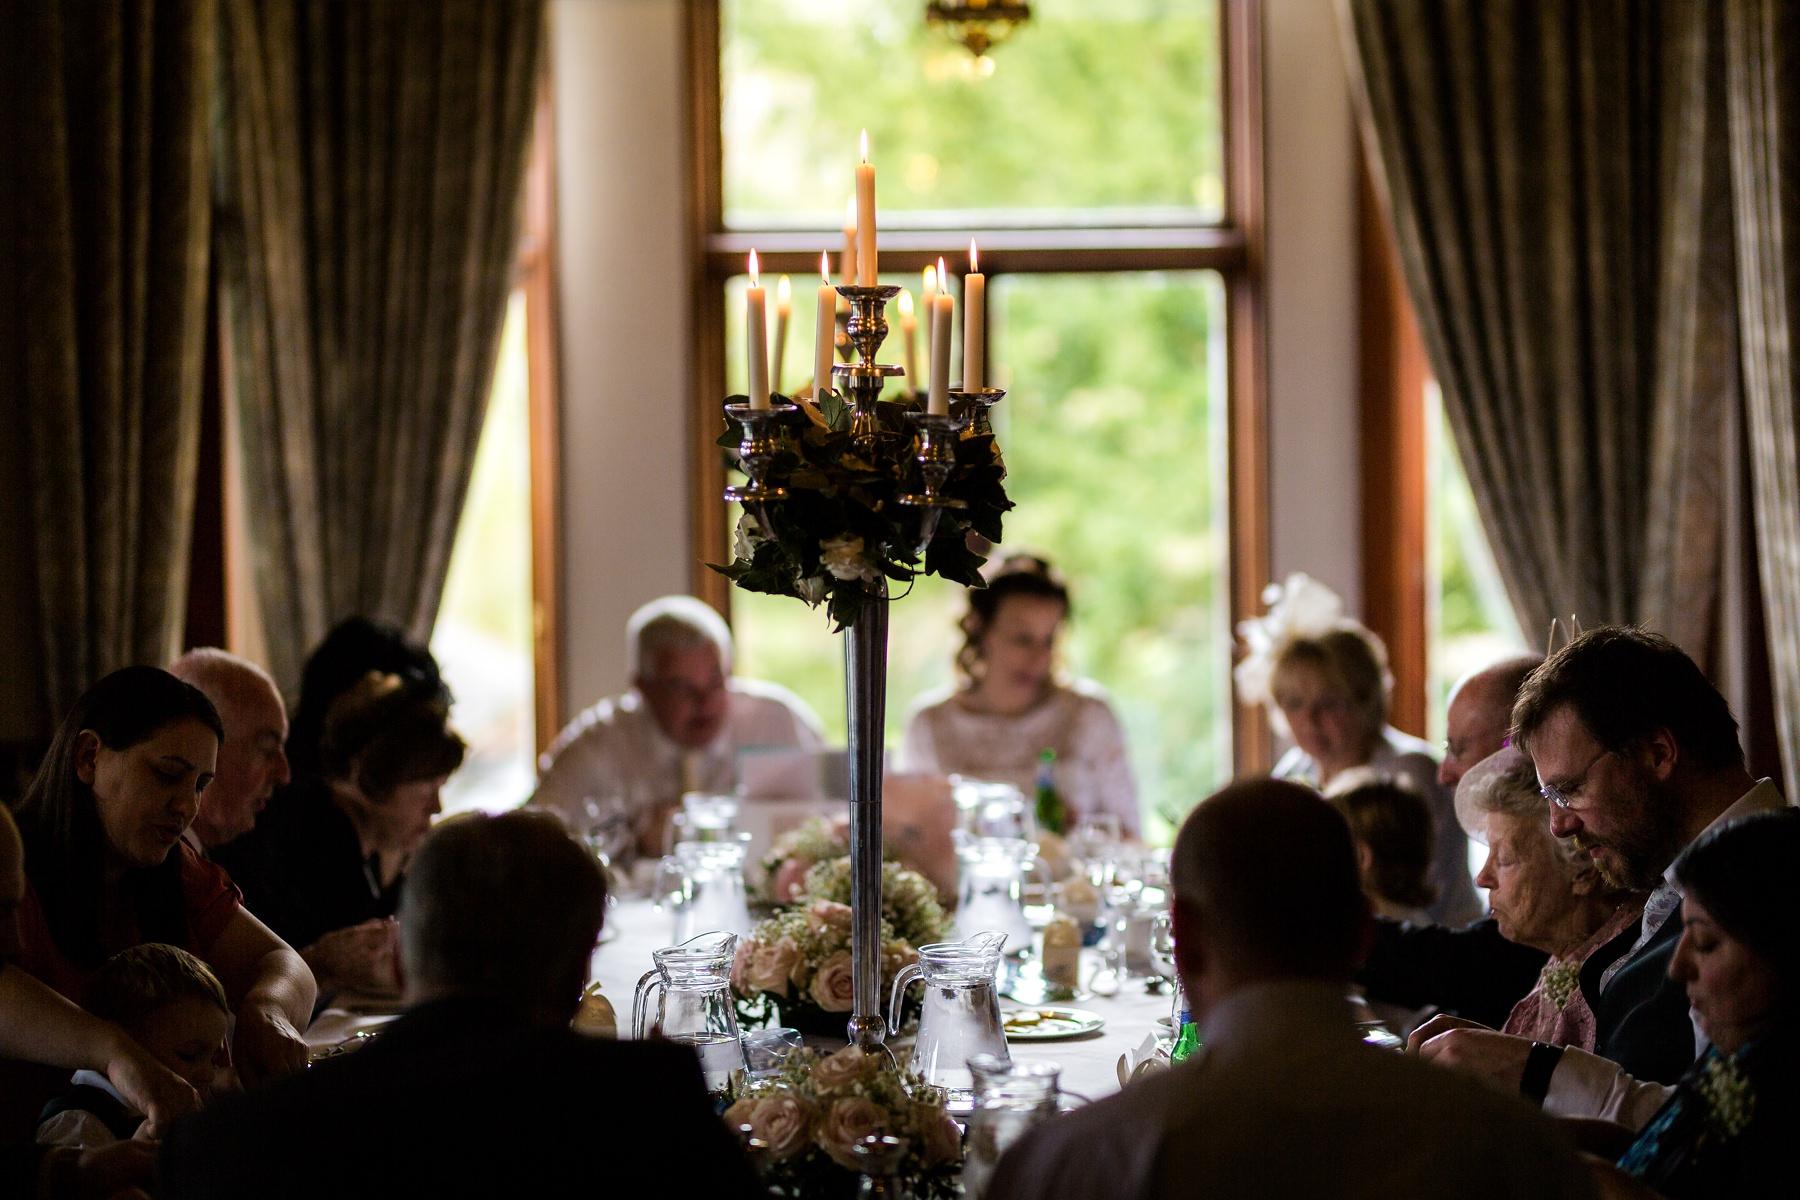 intimate-wedding-at-kilhey-court-lancashire-photographer_0030.jpg